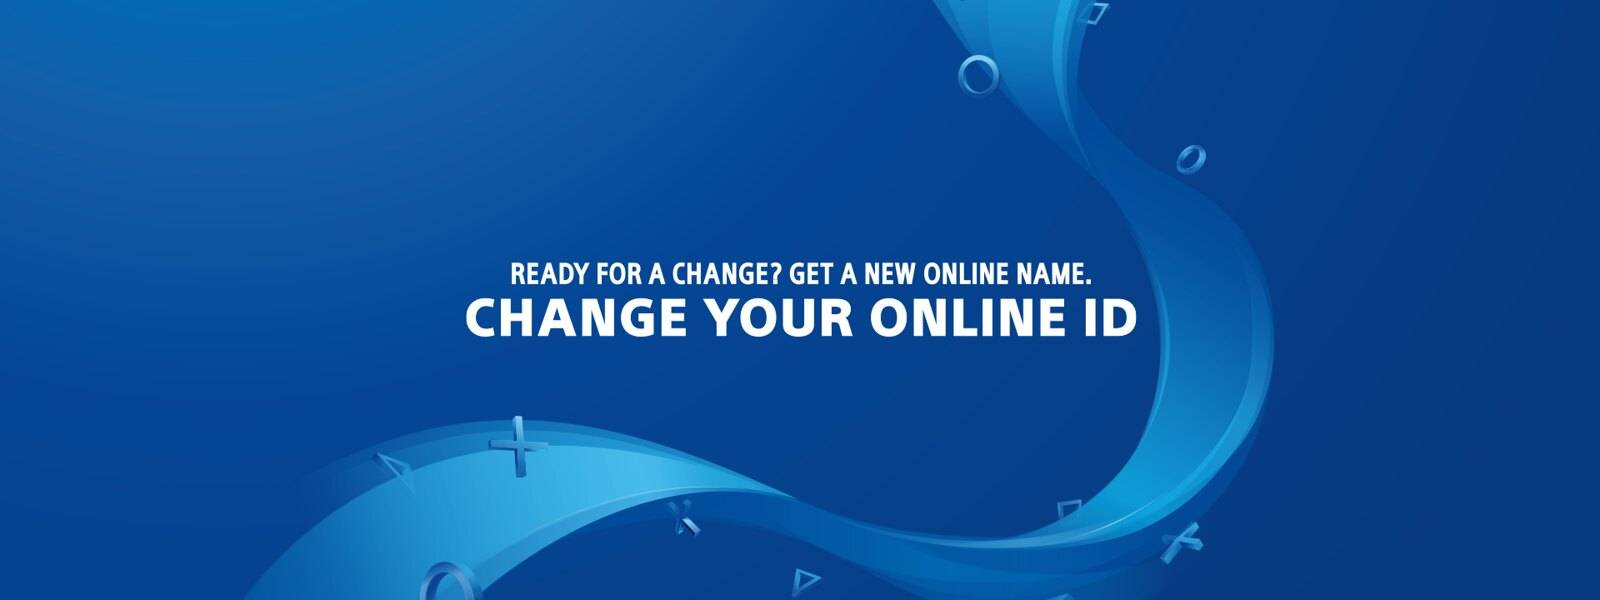 Online ID